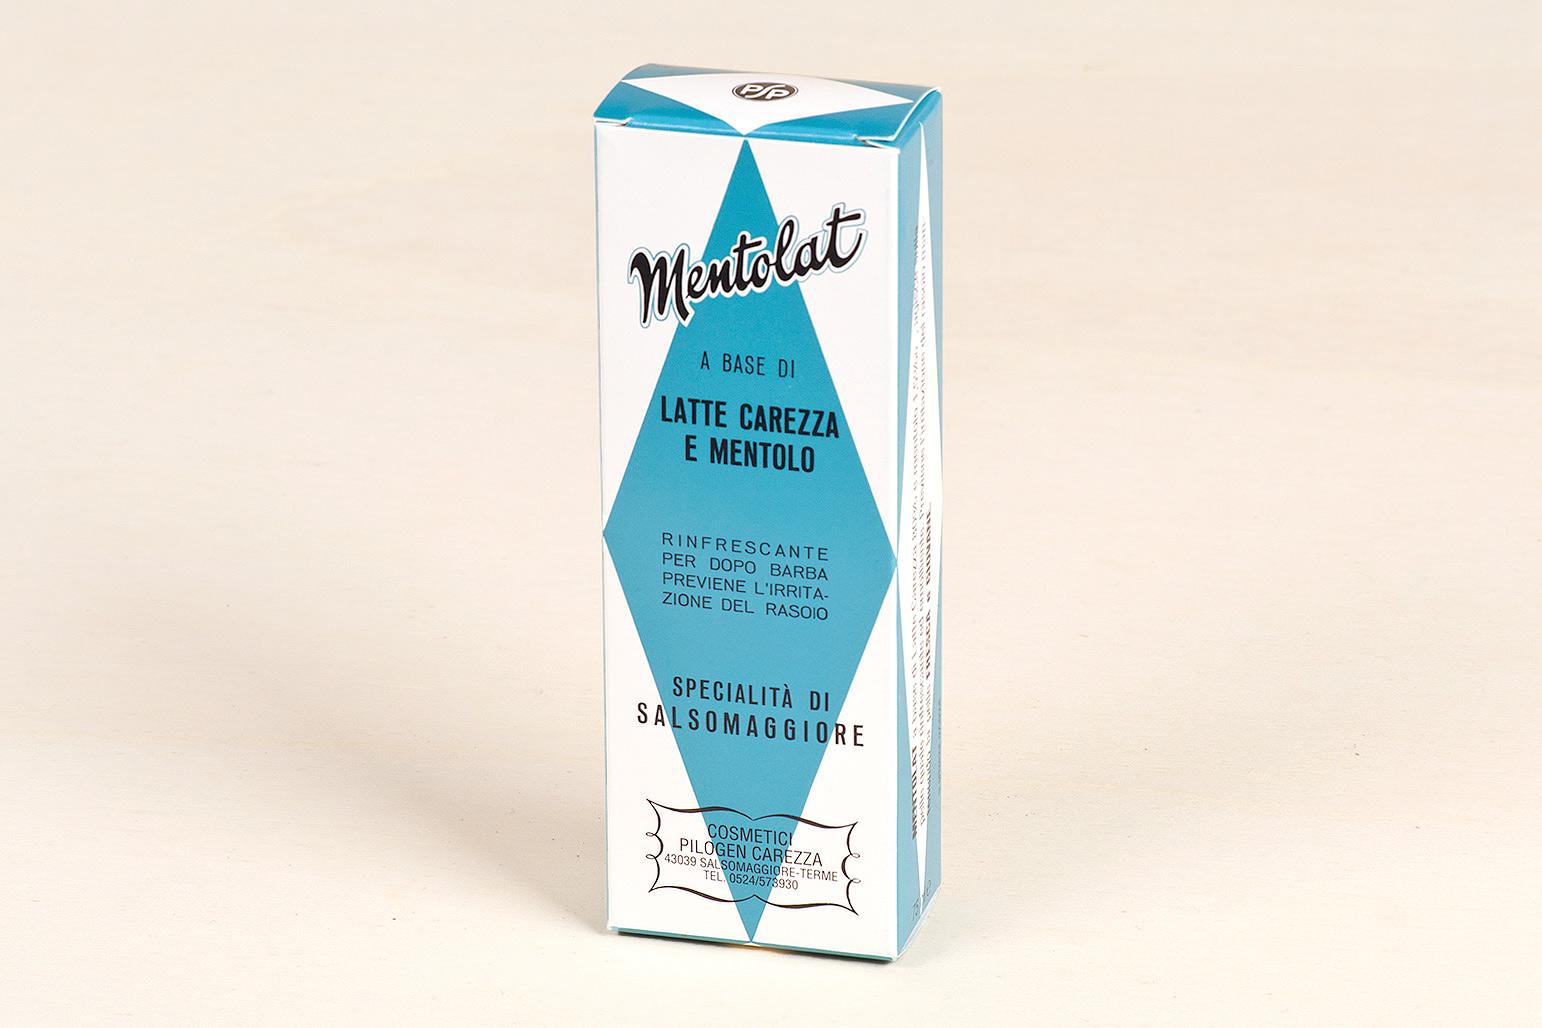 mentolat.3.4.b.fattobene